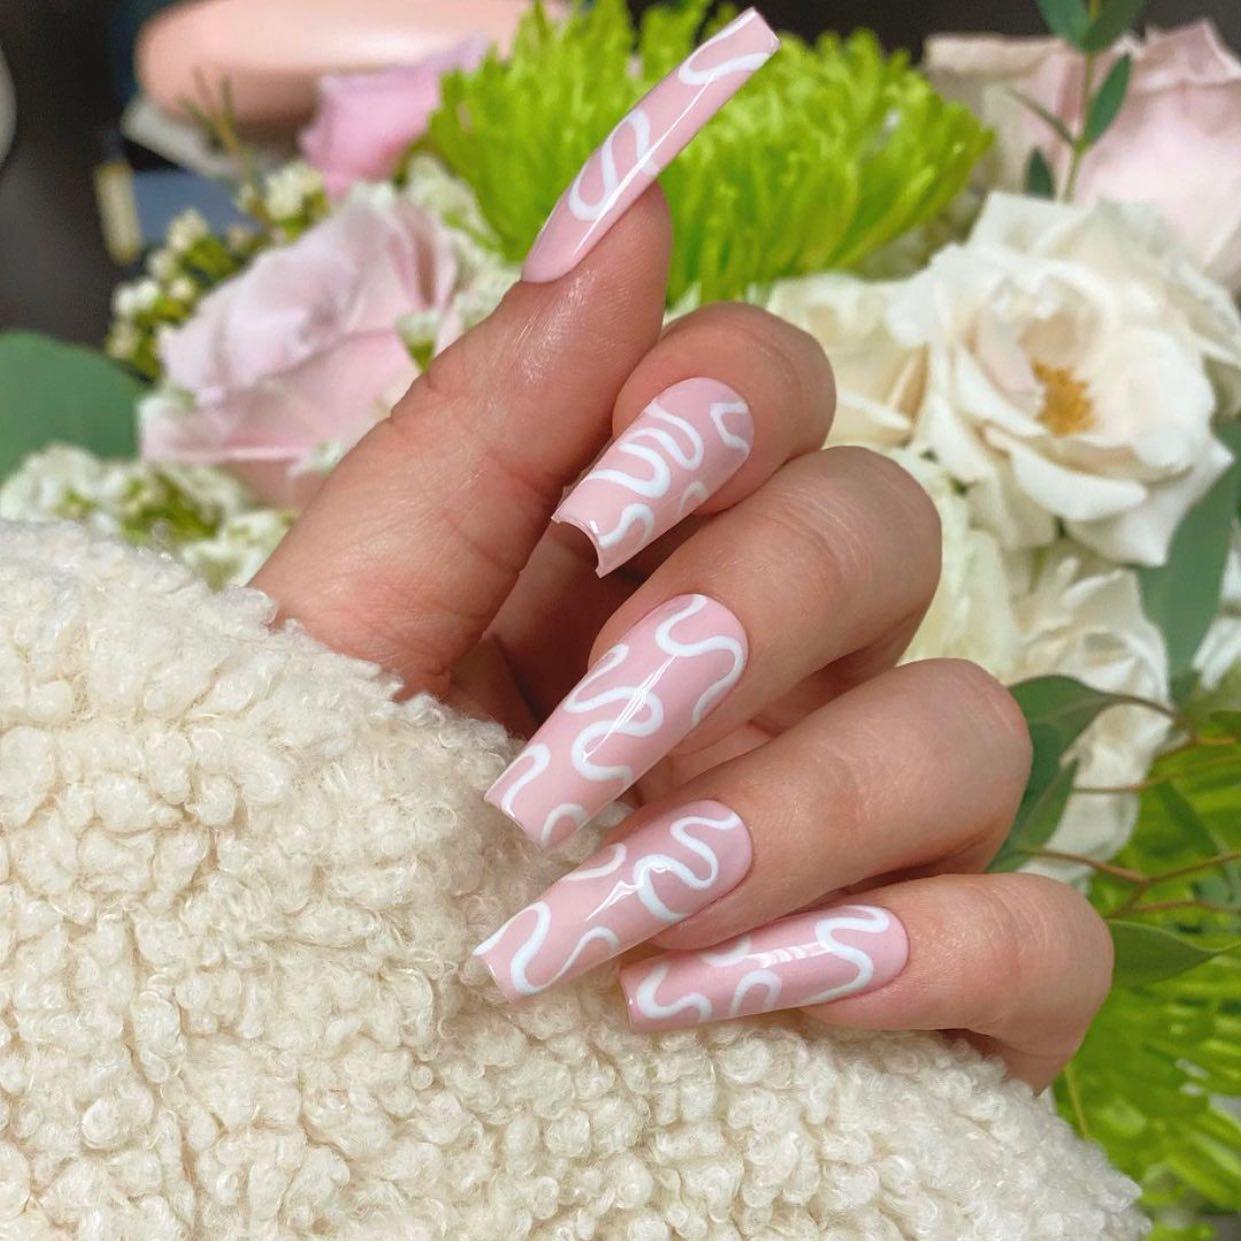 tammy taylor nail design